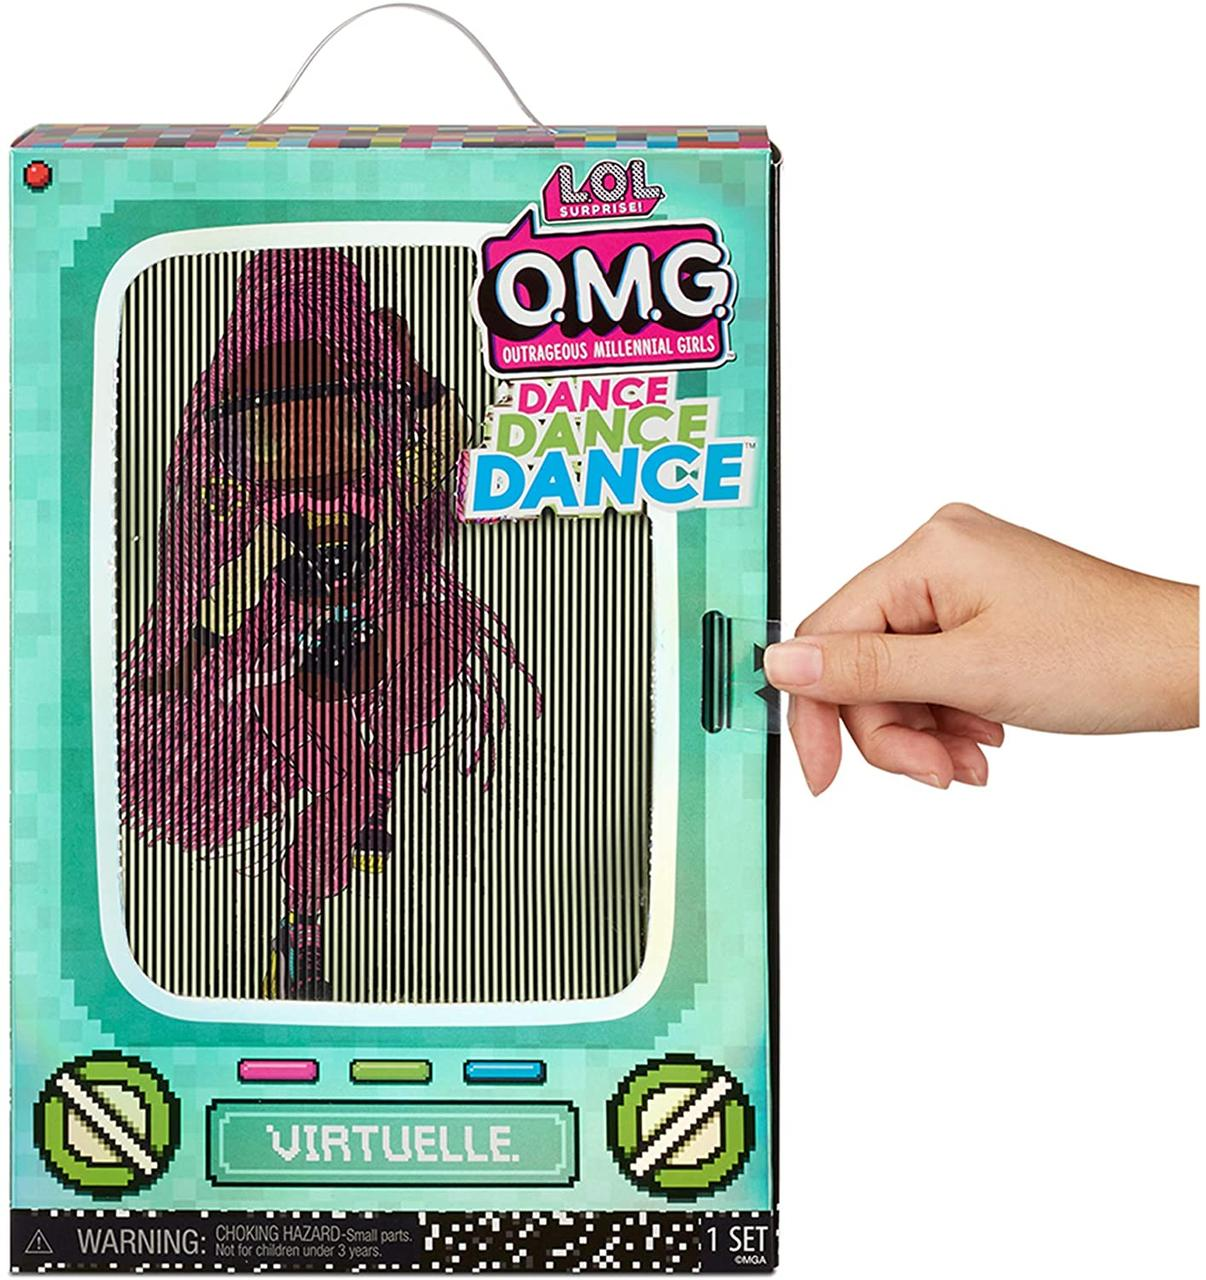 LOL OMG Dance Неоновая Кукла ЛОЛ ОМГ Дэнс Виртуаль, ЛОЛ Сюрприз - фото 2